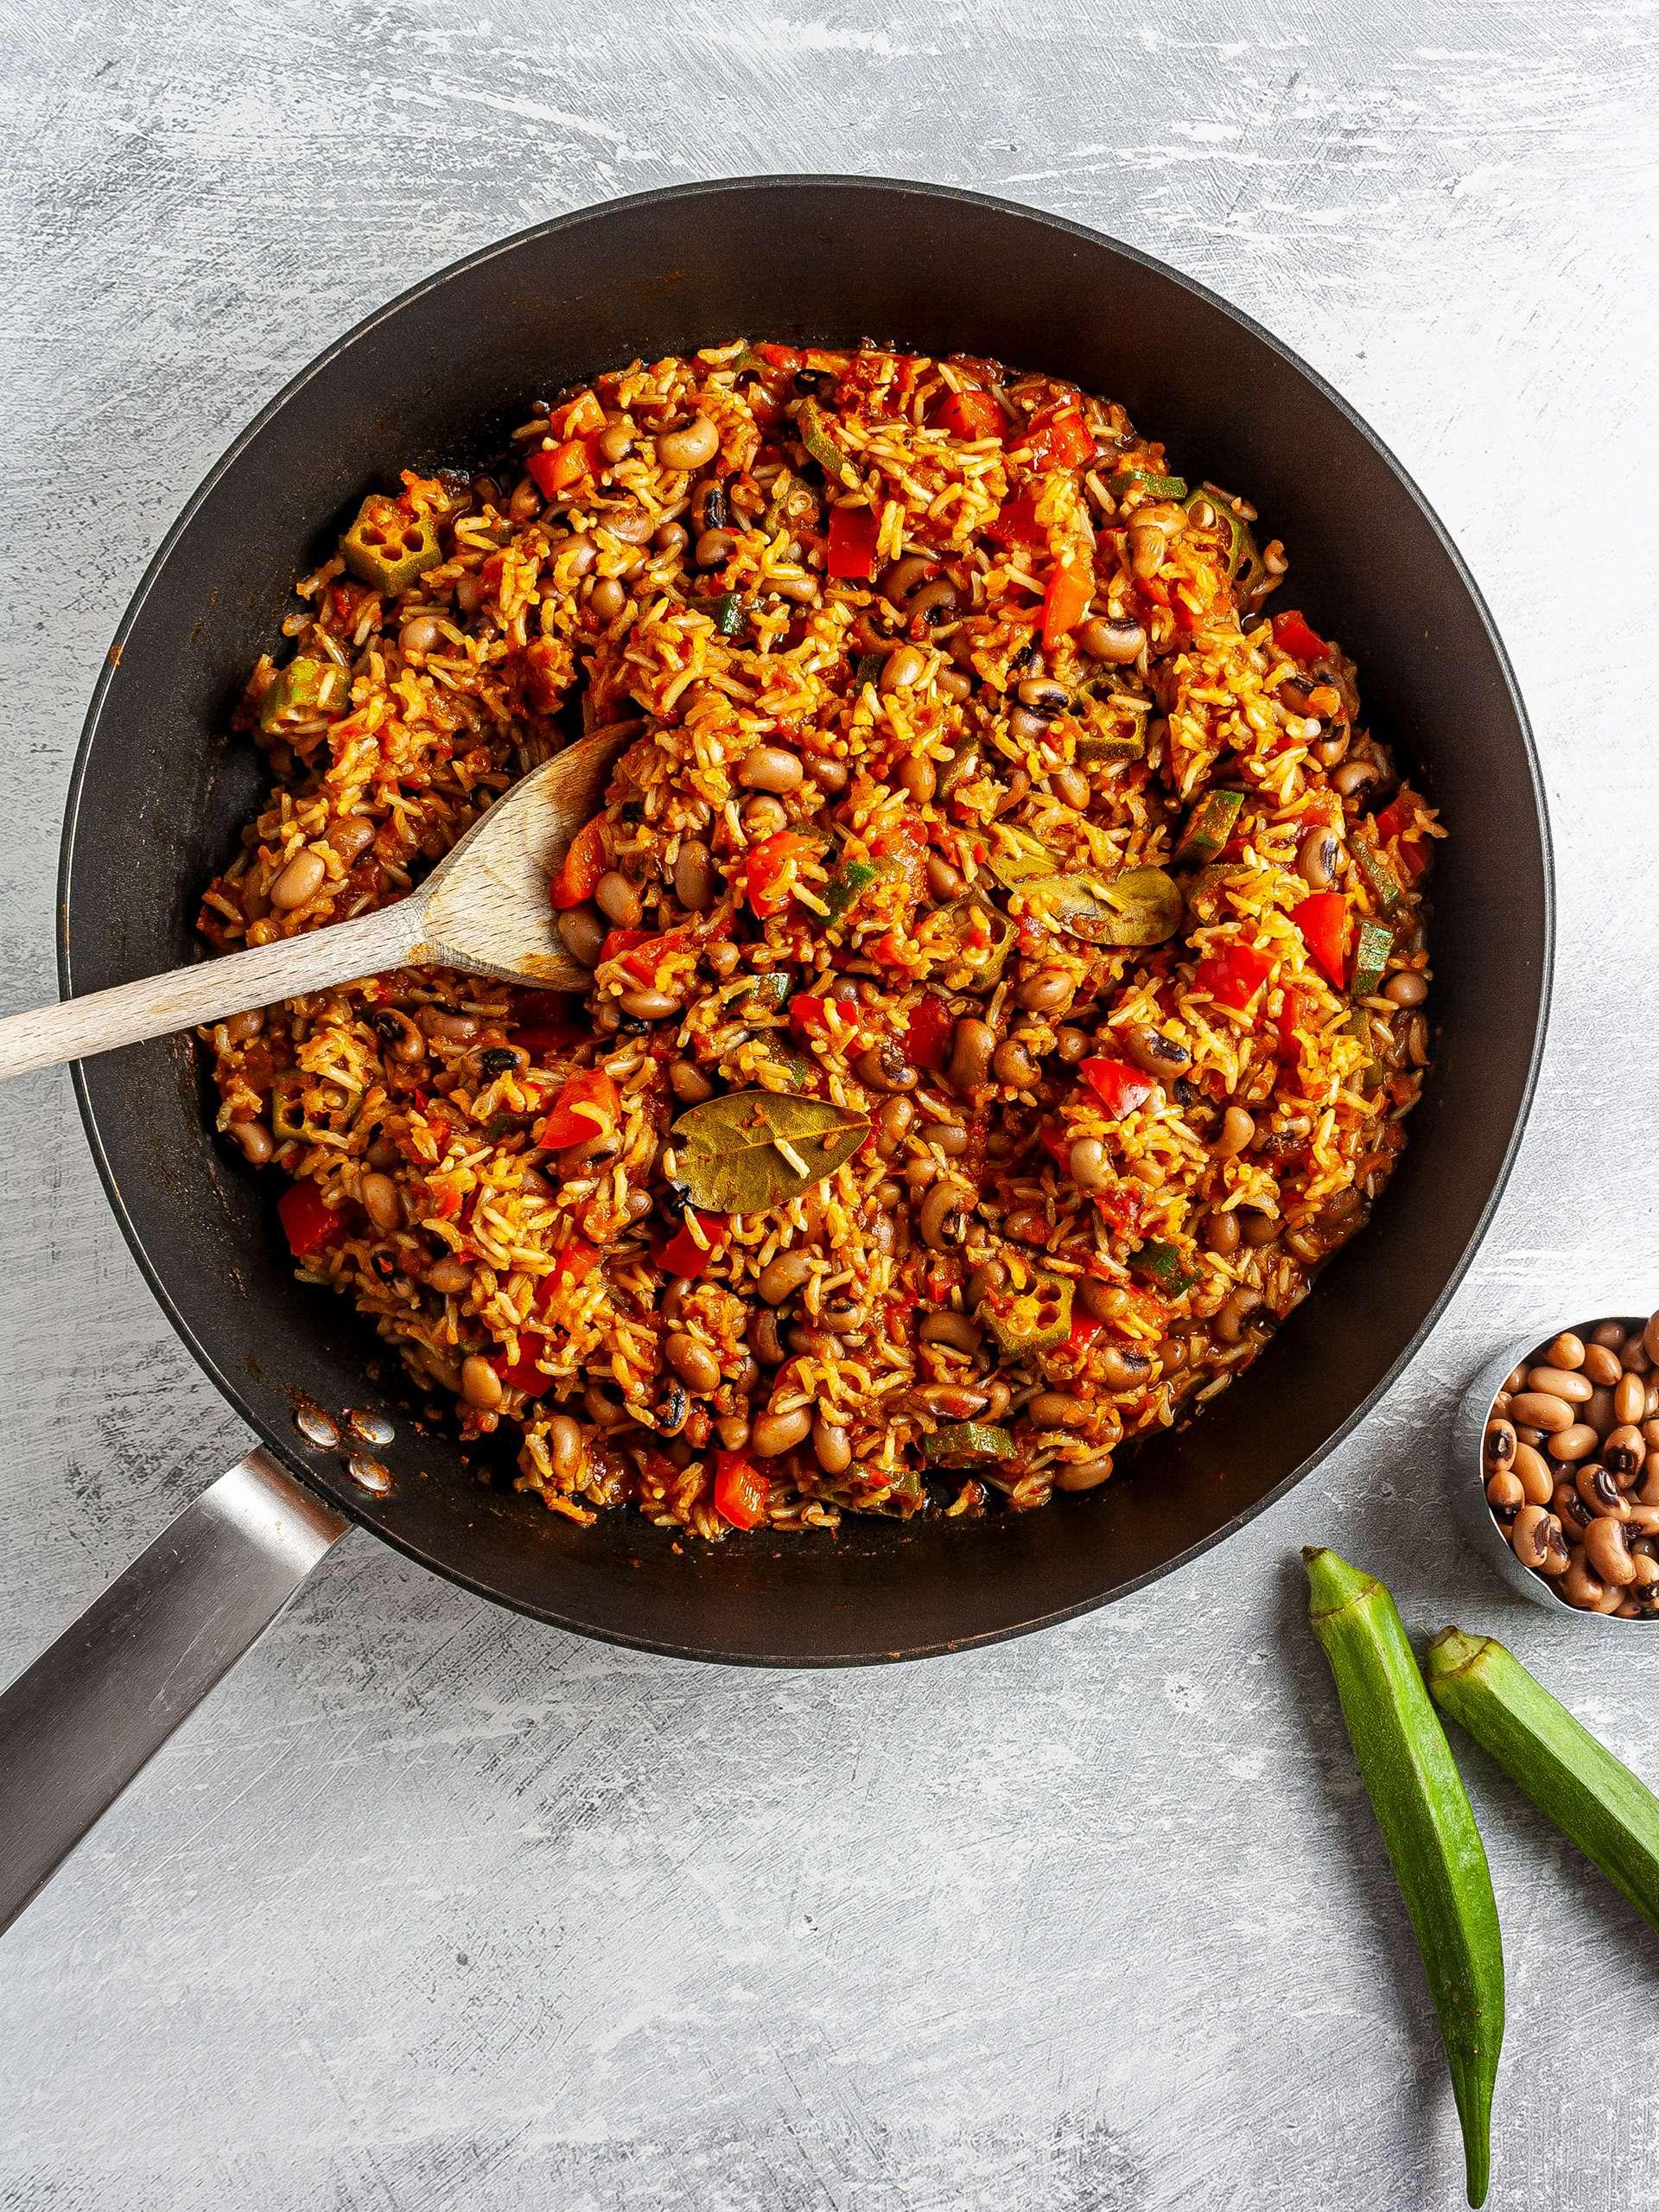 Jollof rice with black-eyed peas and okra